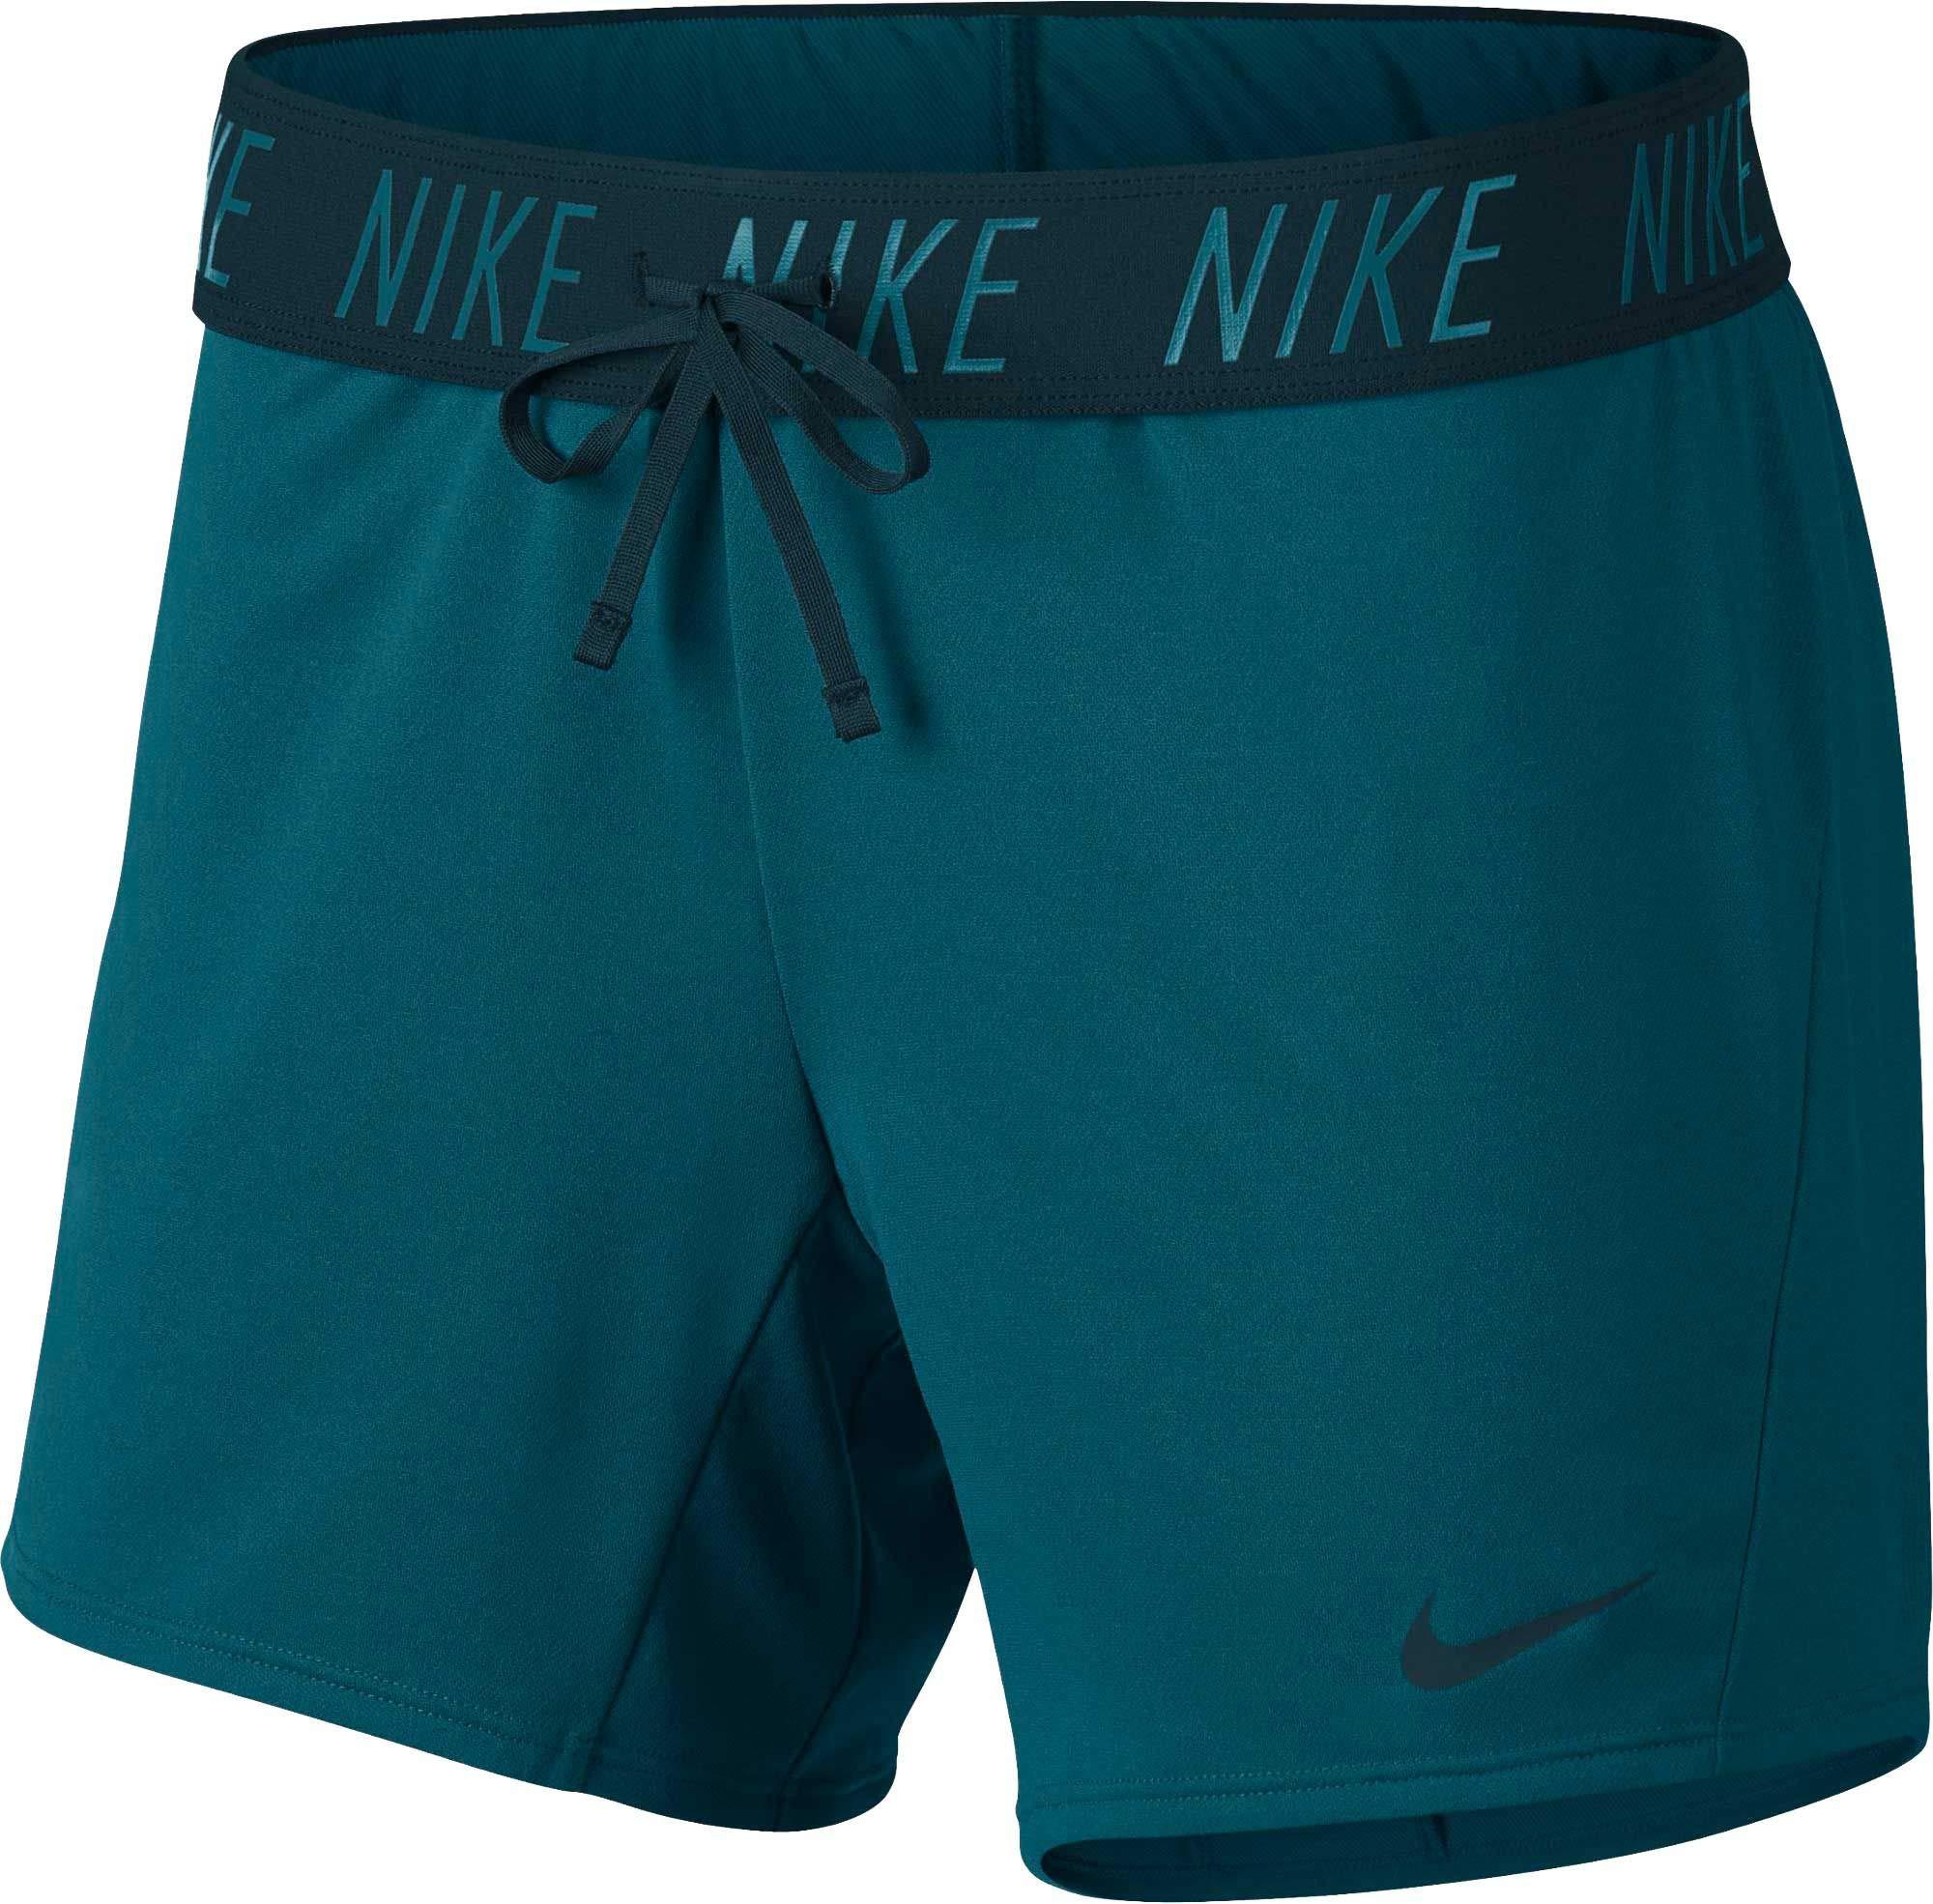 NIKE Women's 5'' Dri-FIT Attack Training Shorts,(Geode Teal/Midnight Spruc,X-Small)